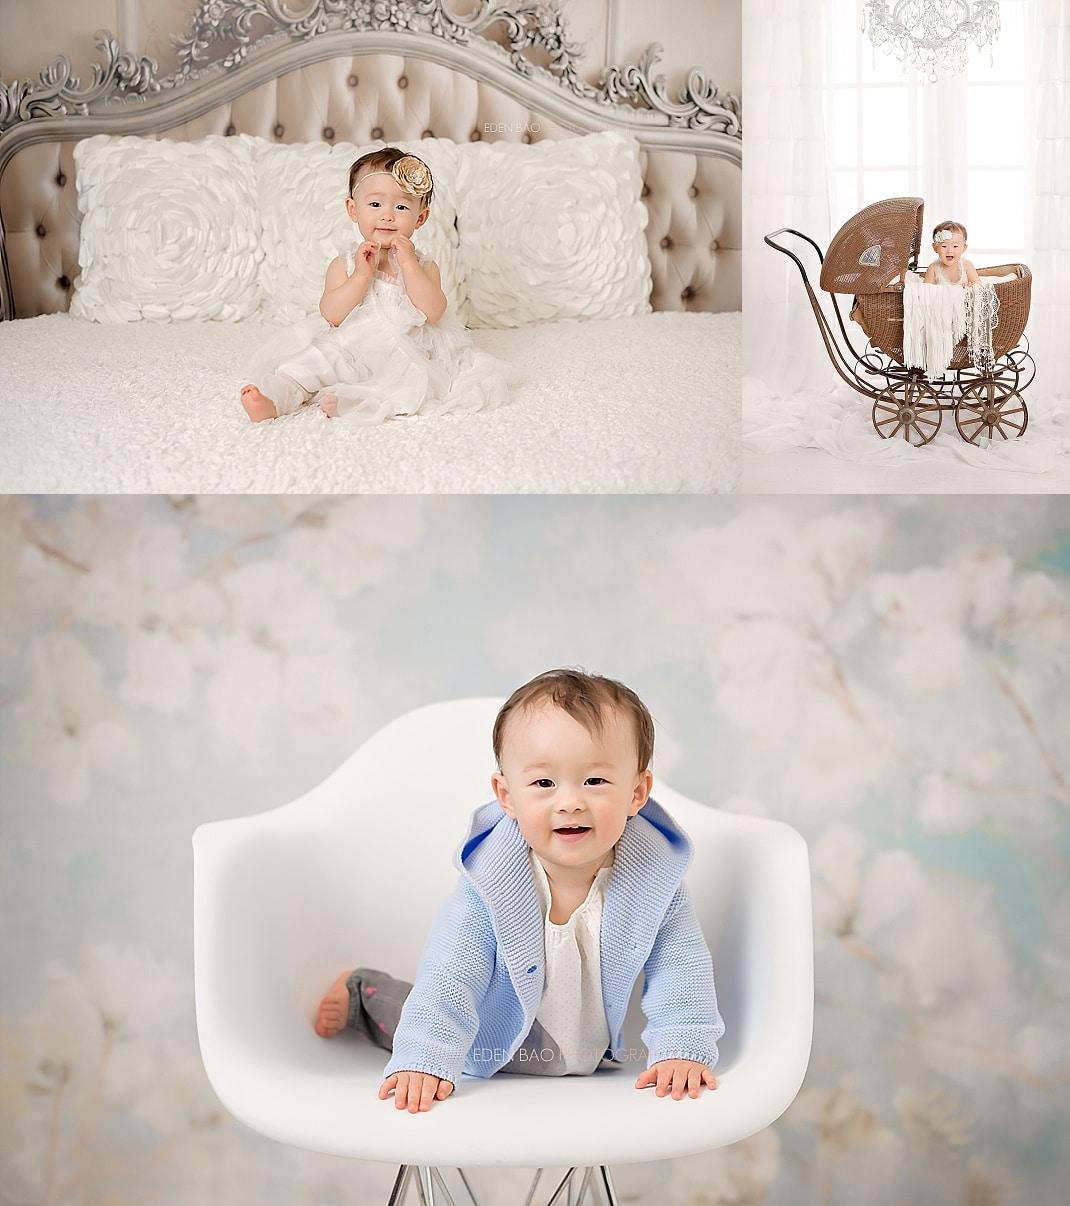 mercer-island-baby-photographer-baby-on-white-chair